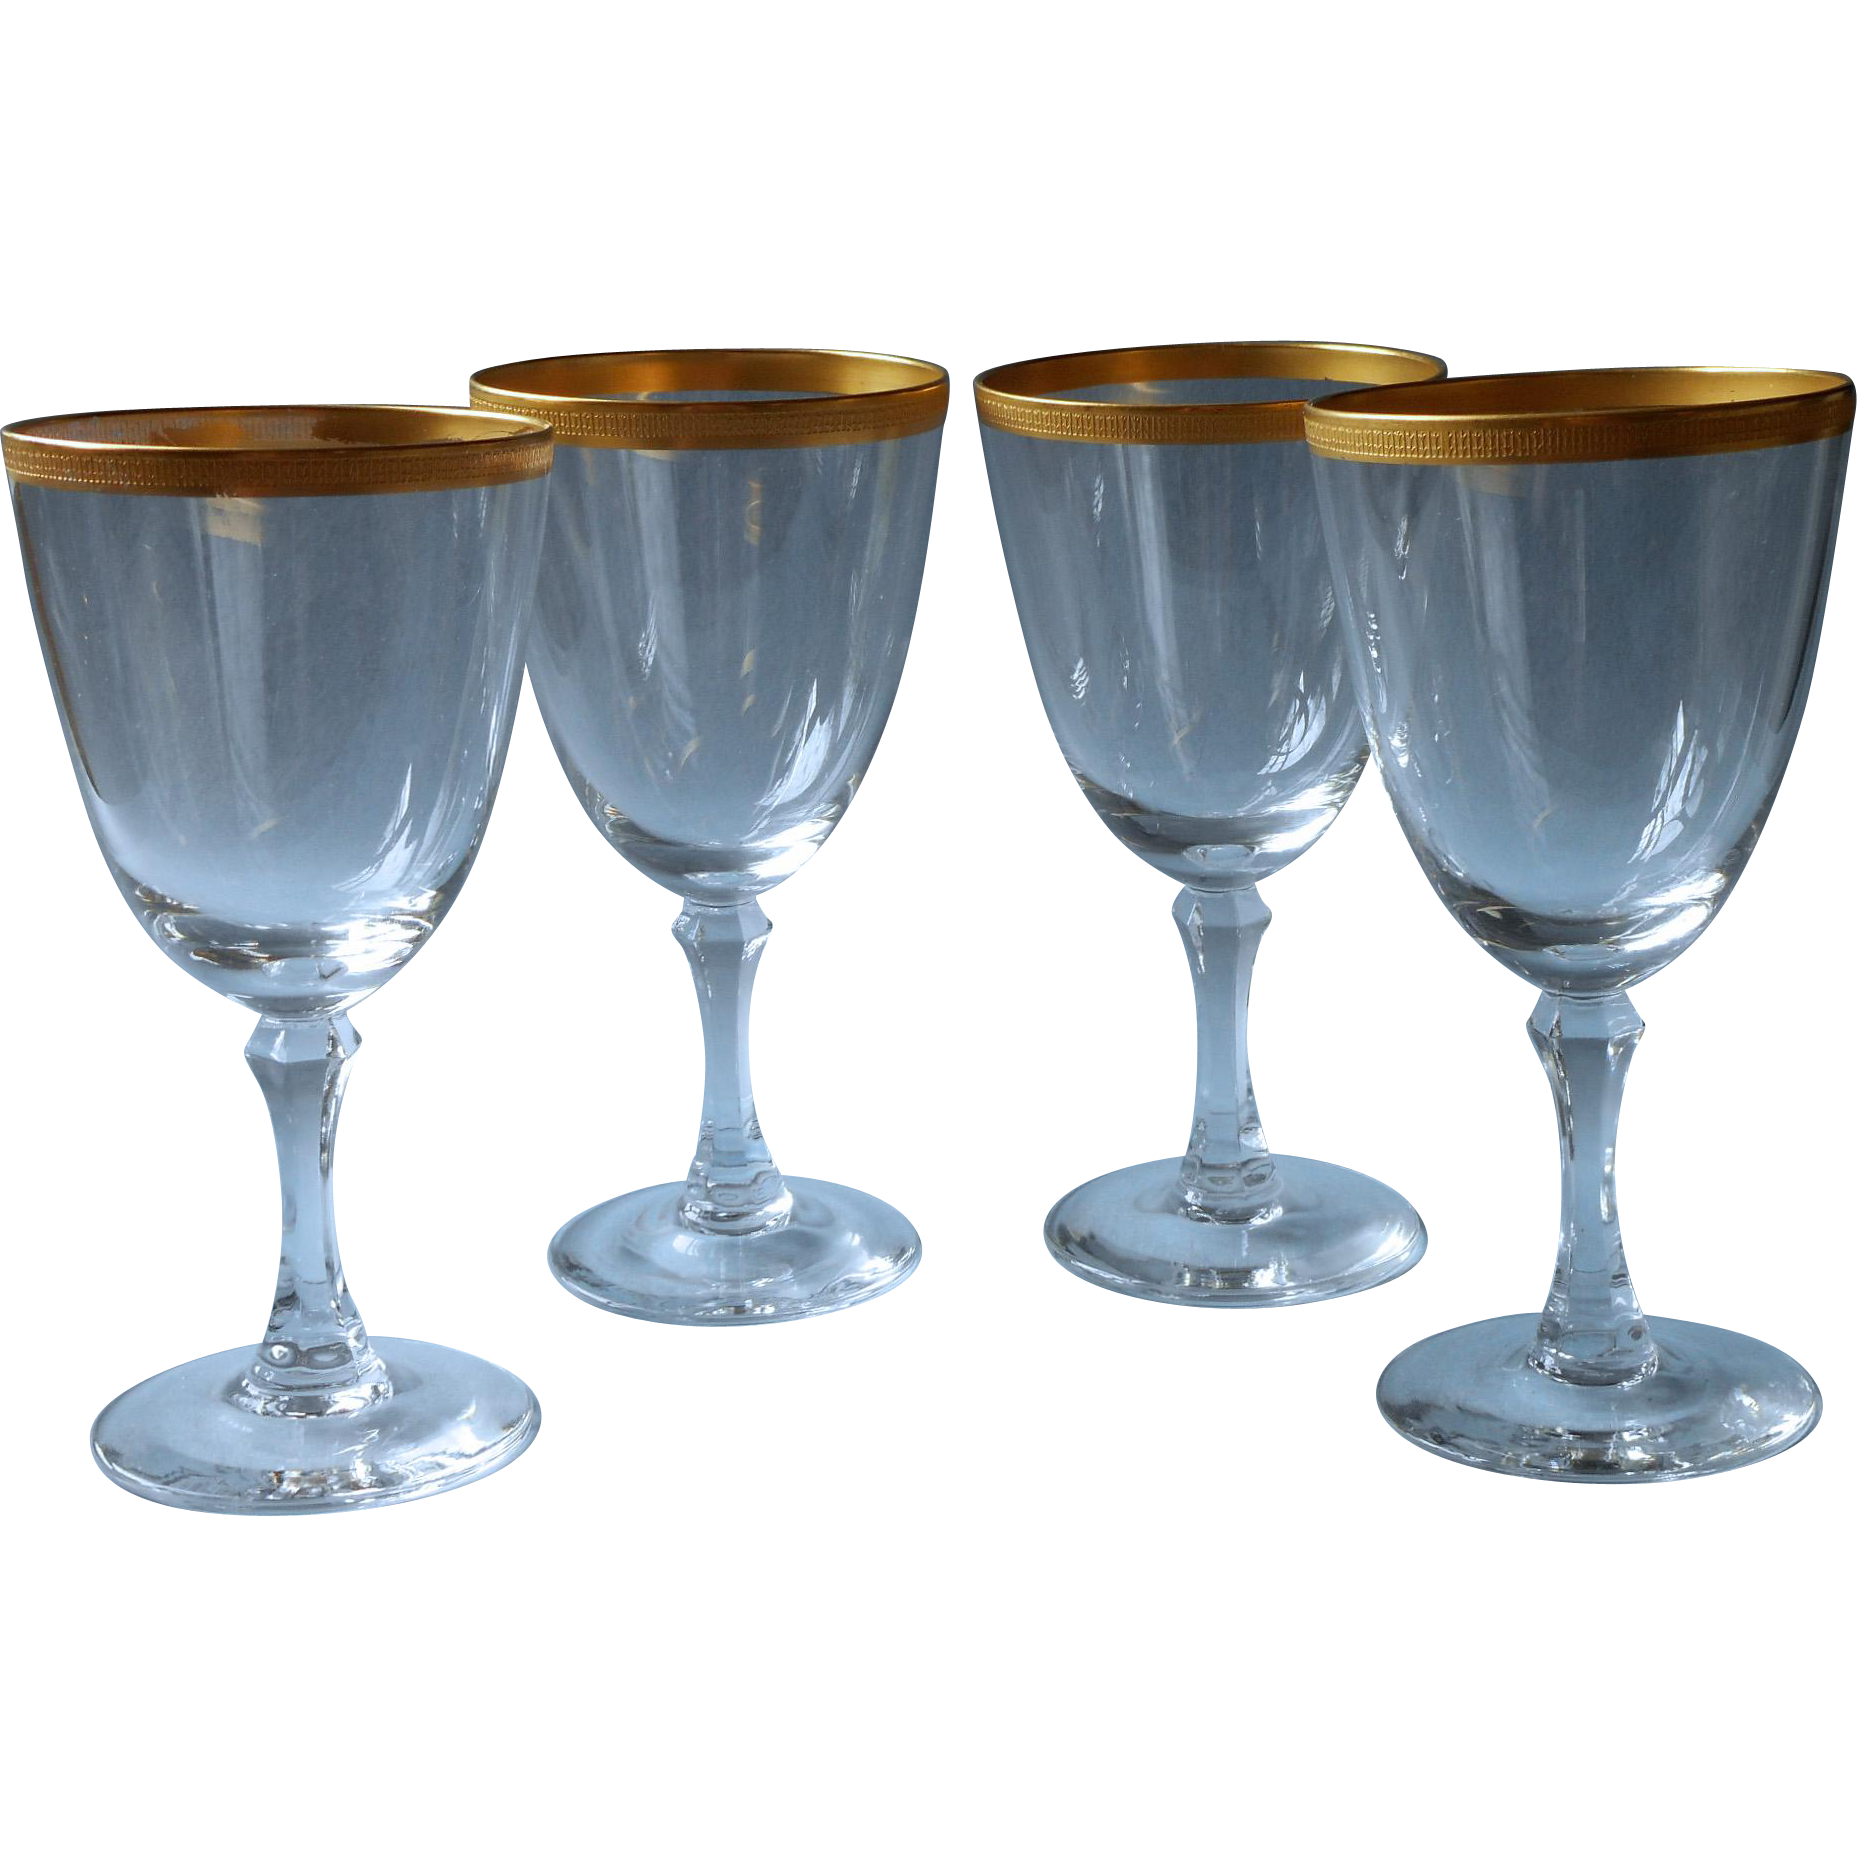 lenox tuxedo 4 crystal wine glasses gold encrusted rims vintage